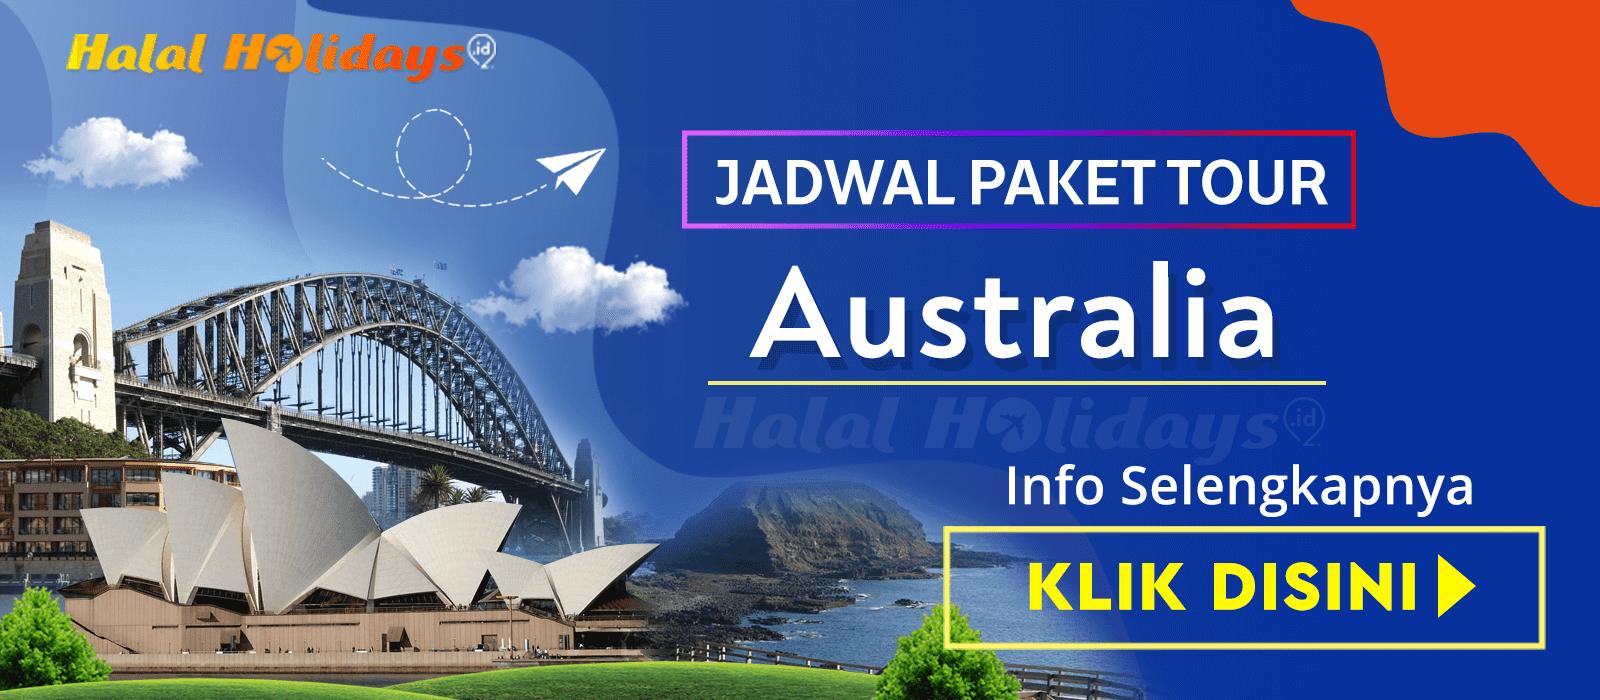 Paket Wisata Halal Tour Australia Murah Tahun 2020